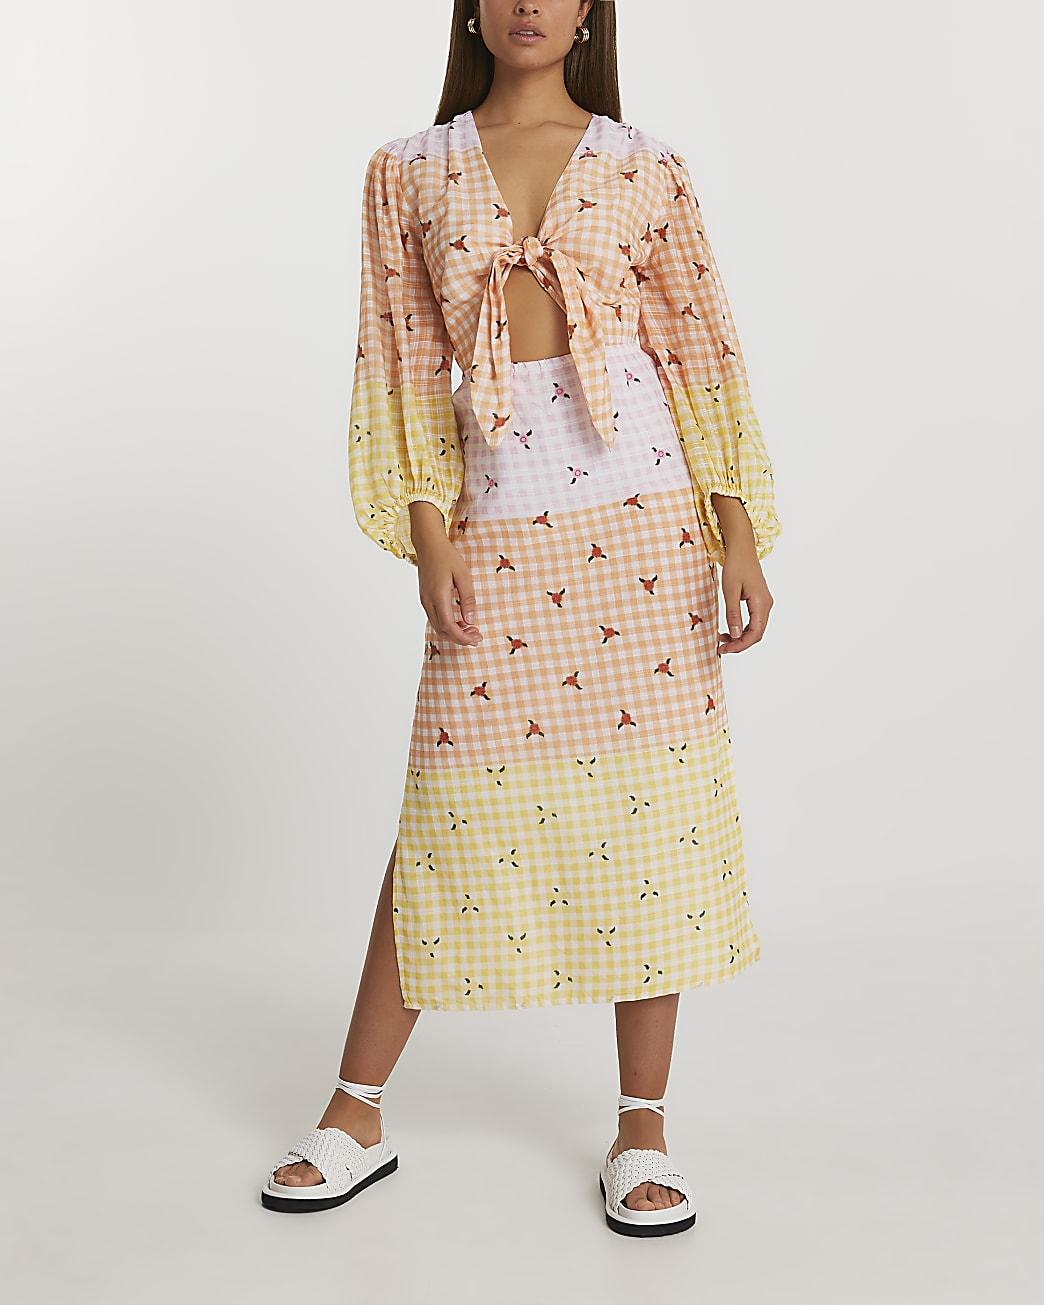 Yellow gingham cut out midi dress